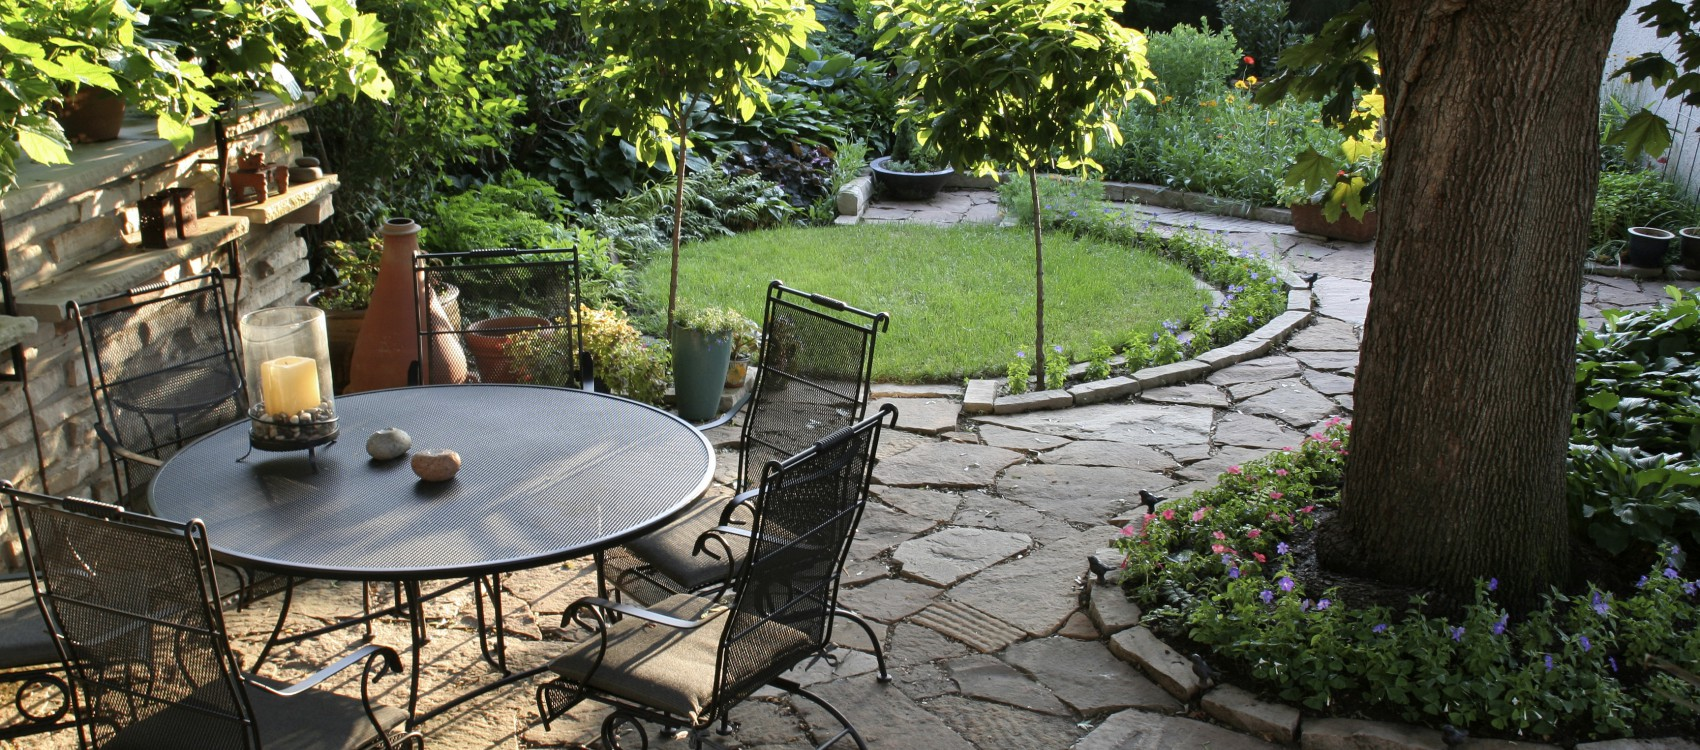 Cincinnati landscaping company